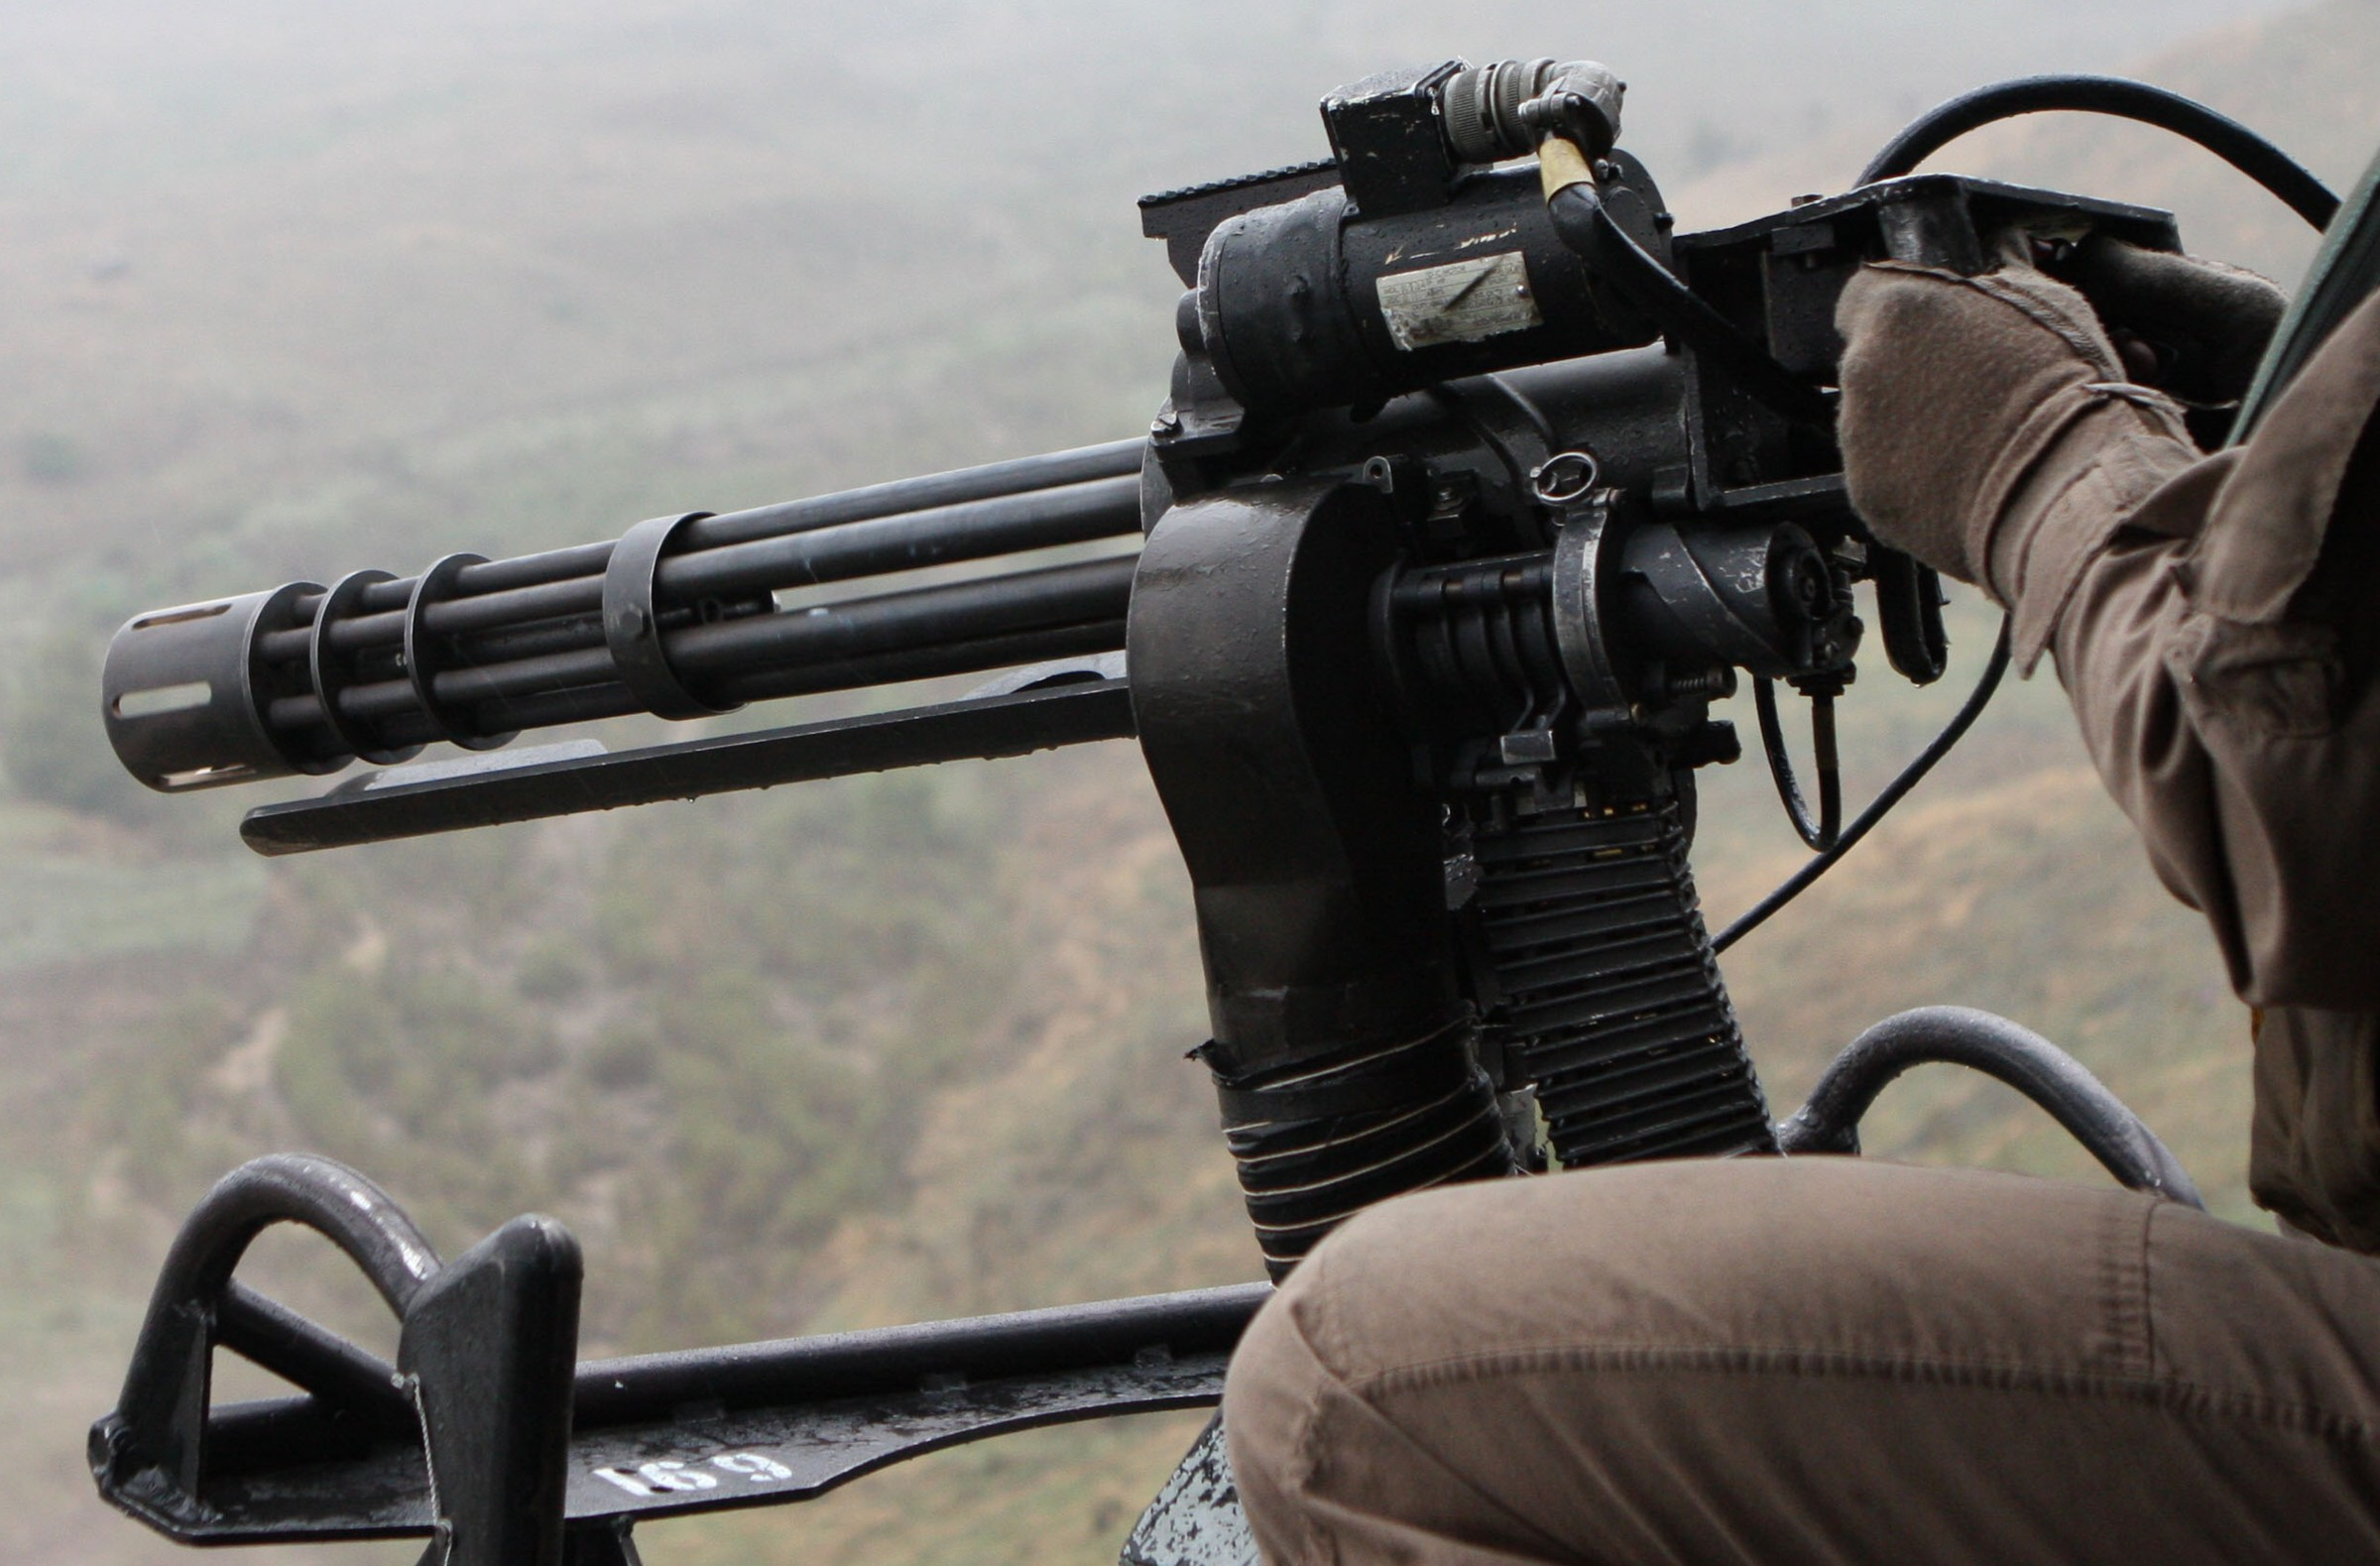 M134 Minigun Rotary Machine Gun System